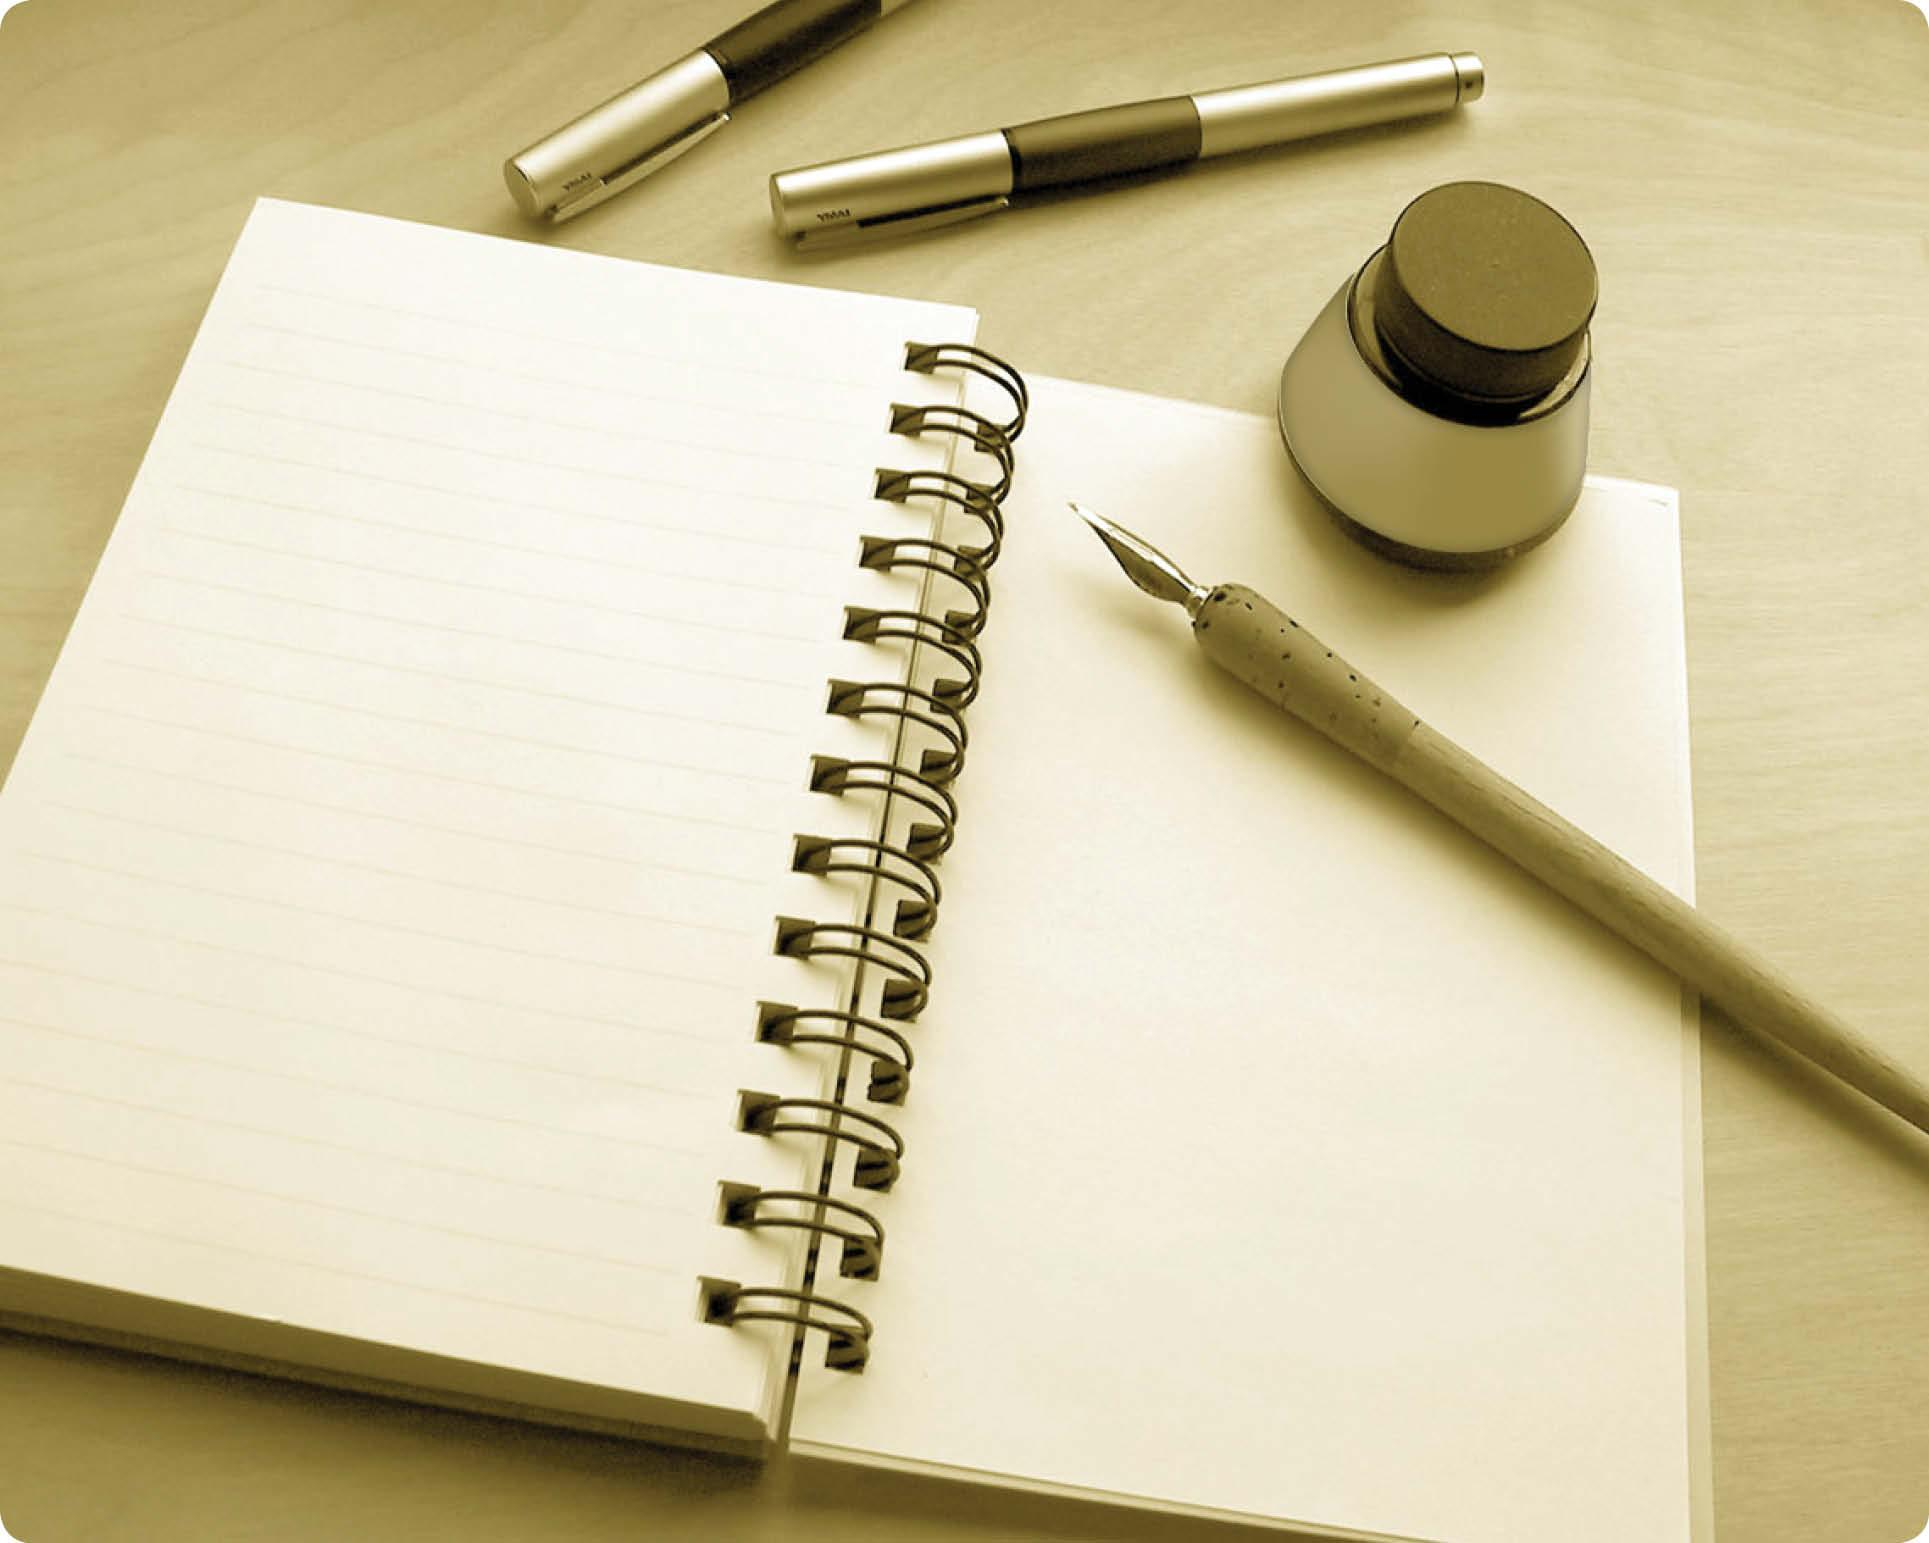 وصیت نامه,اصول نوشتن وصیت نامه,وصیت نامه نویسی